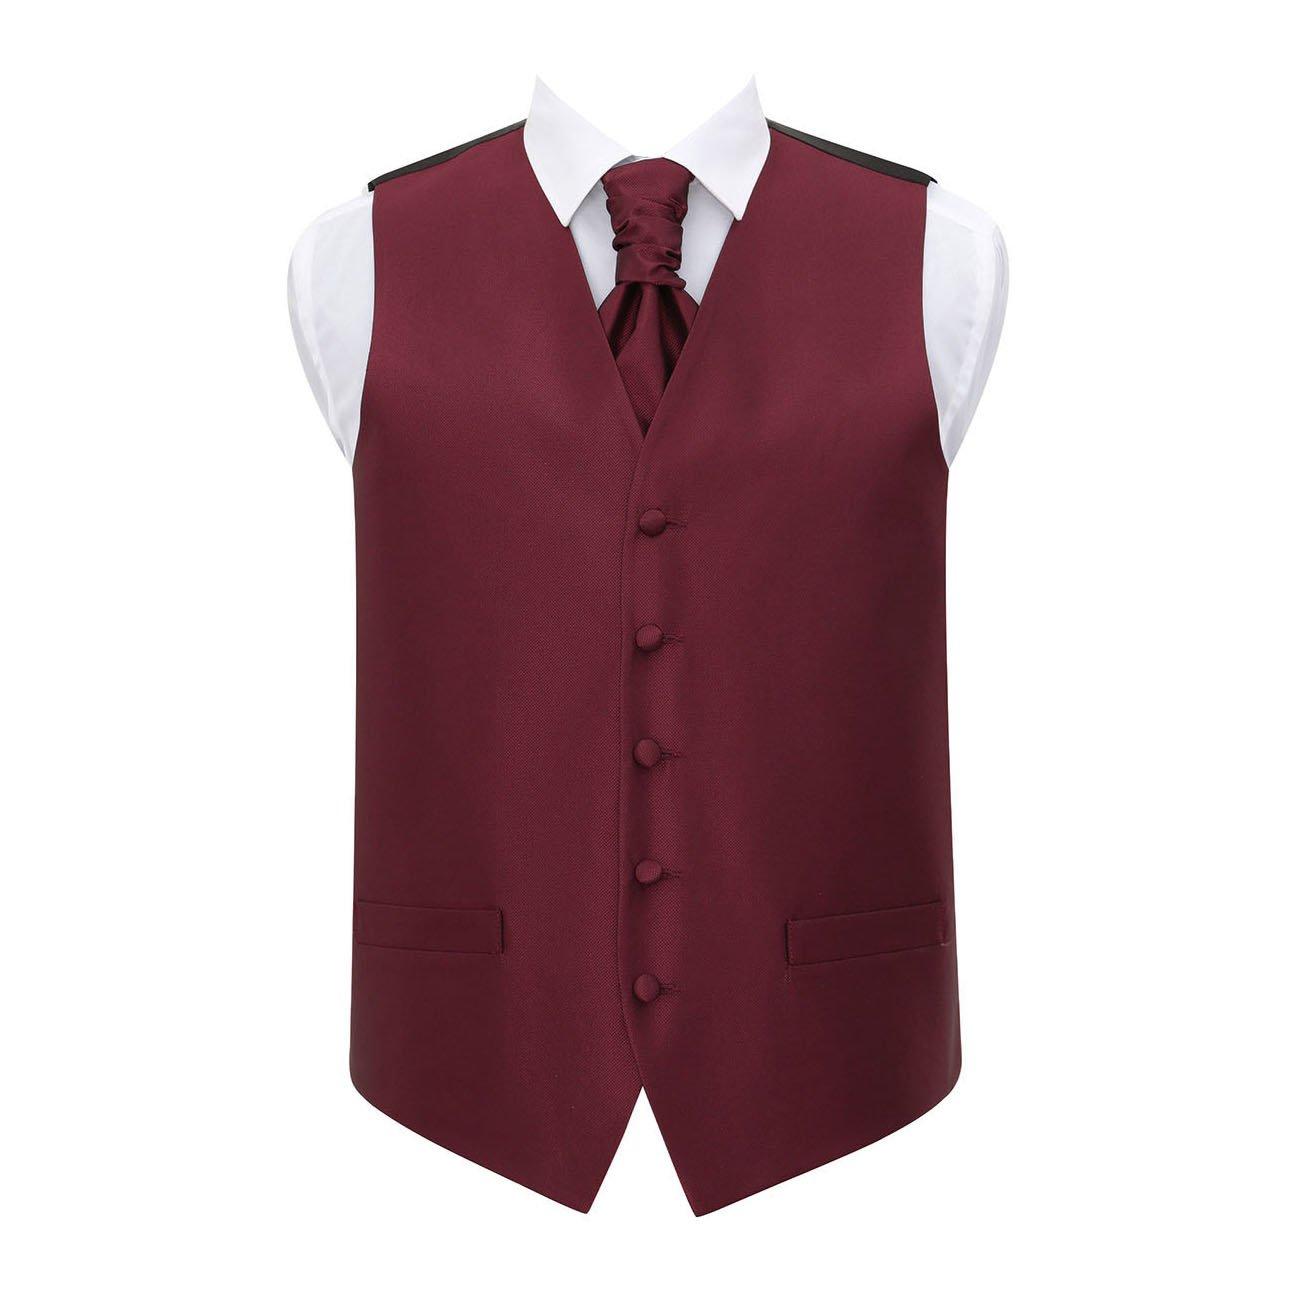 DQT Men Solid Check Plain Waistcoat and Cravat with Cravat Pin